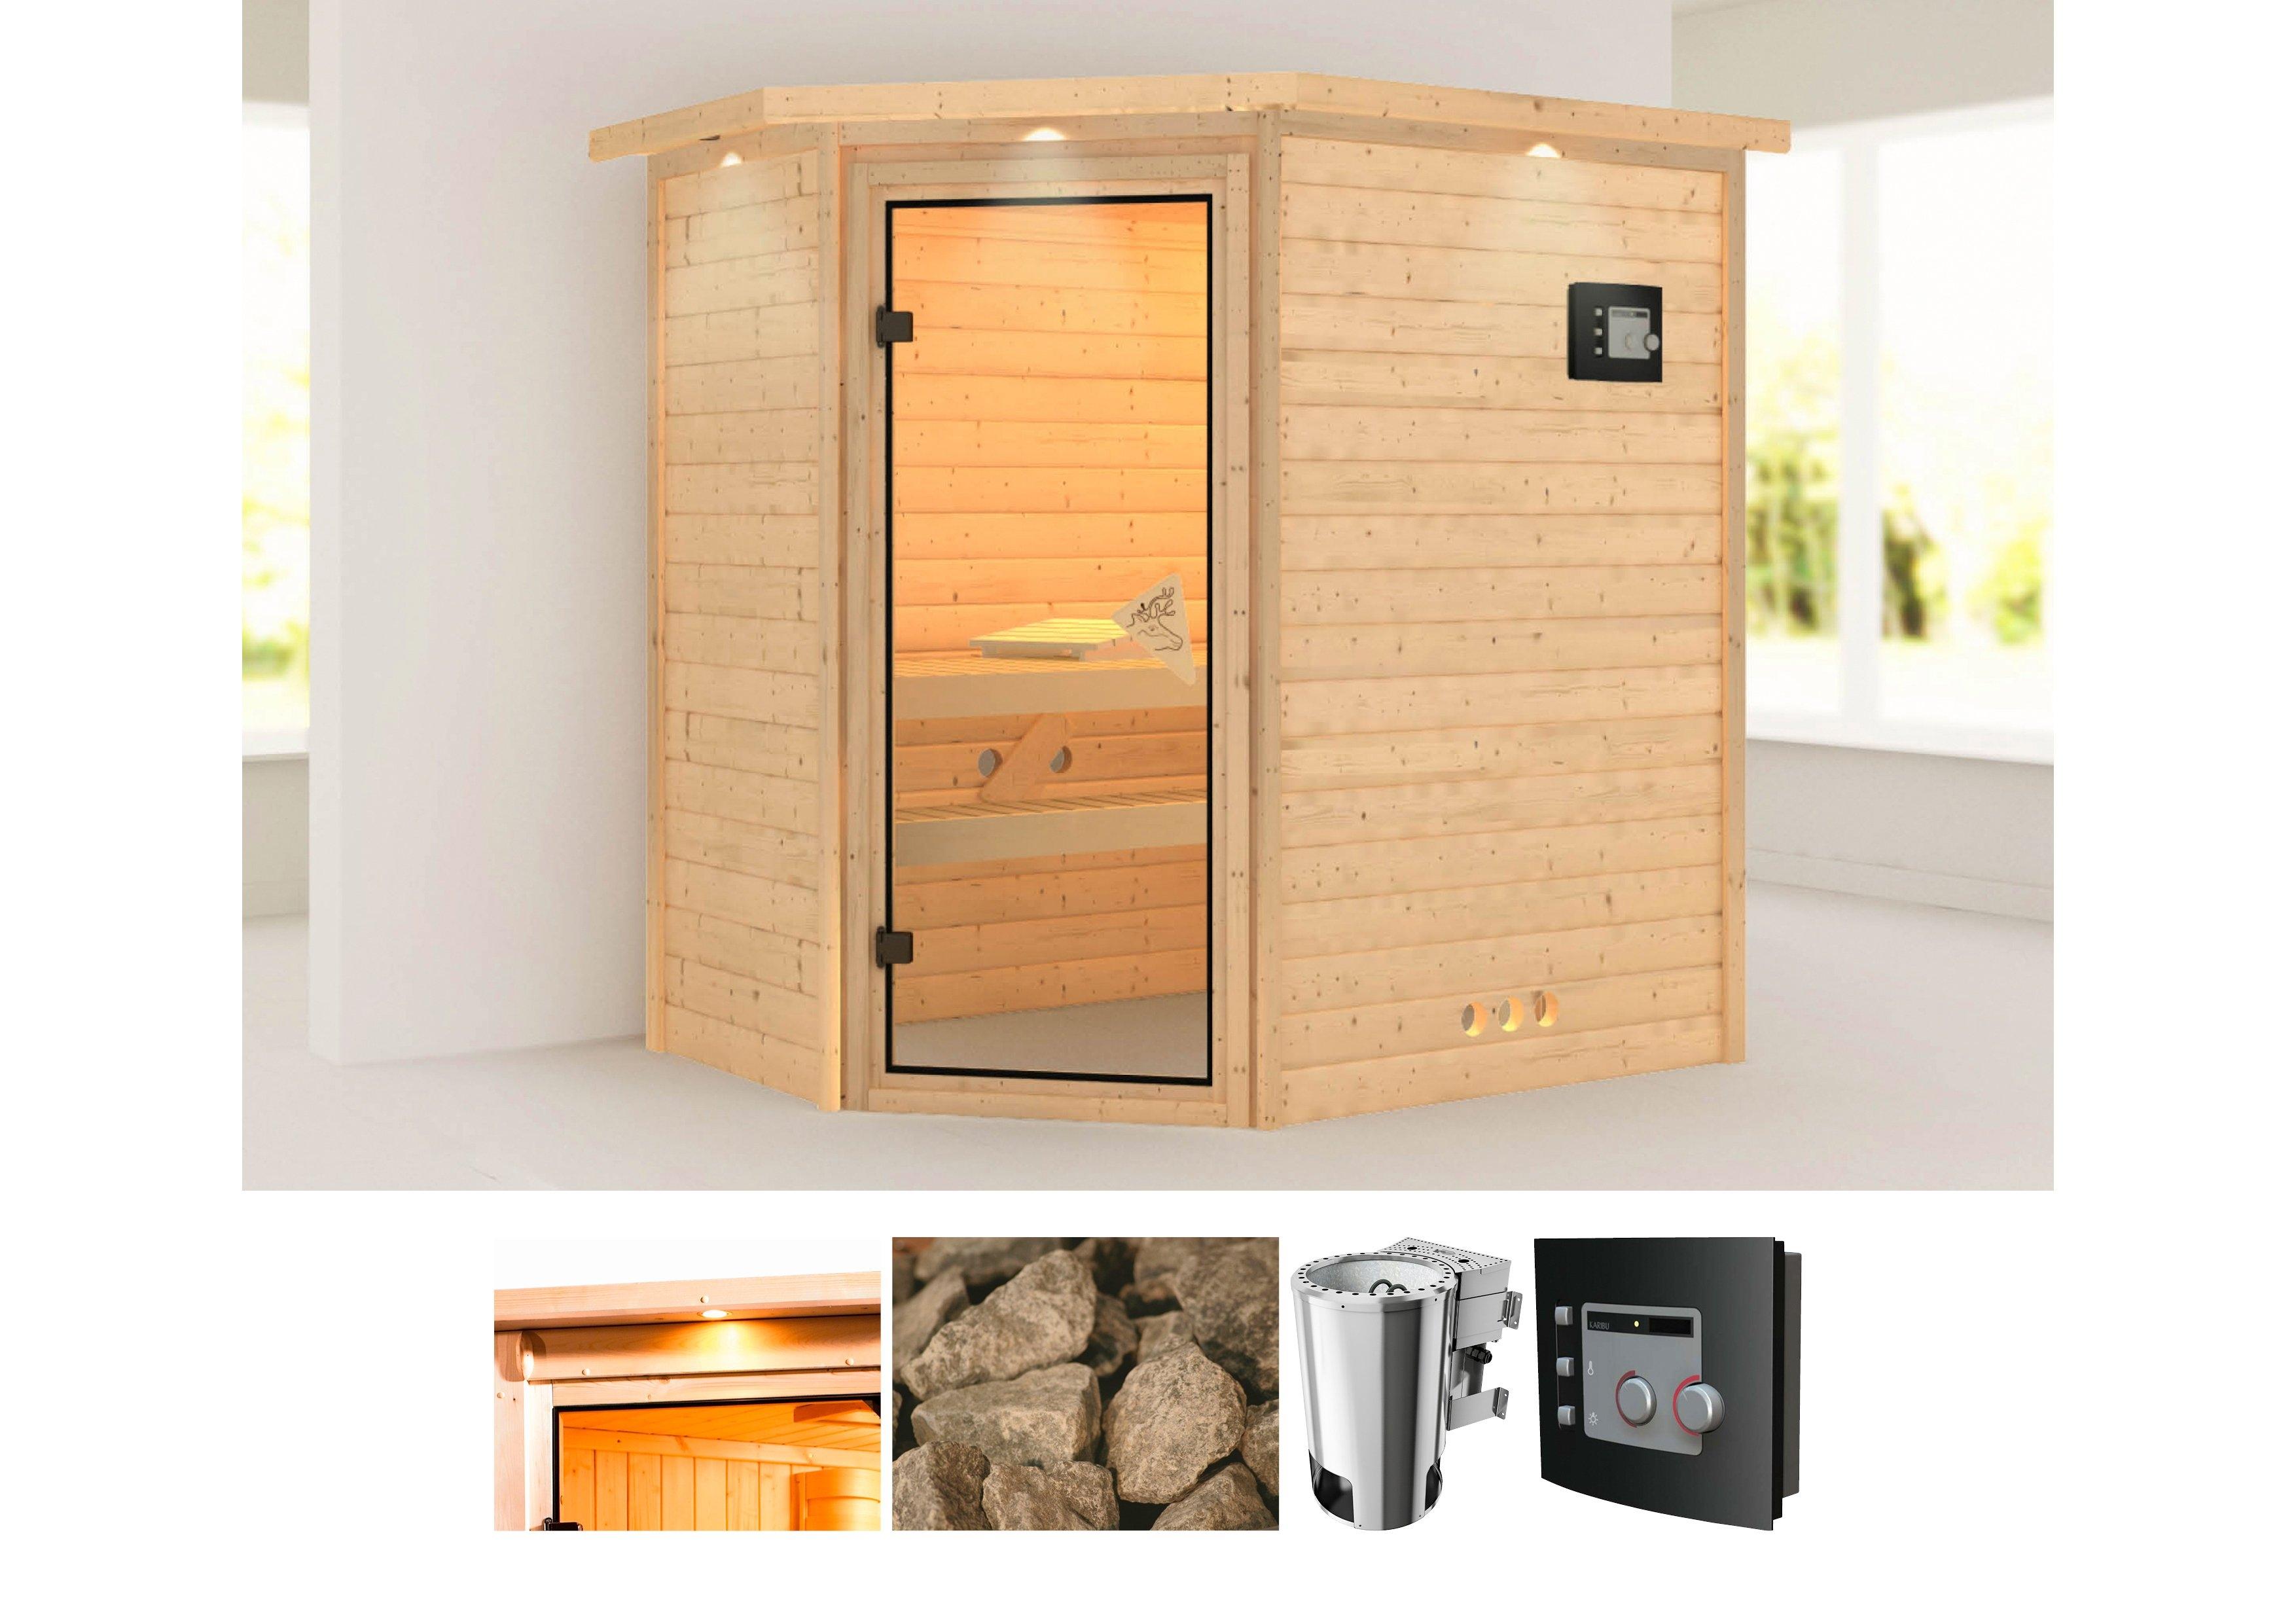 Karibu sauna »Cilja«, 224x160x202 cm, 3,6 kW Plug & Play Bio-Ofen mit ext. Strg. bij OTTO online kopen